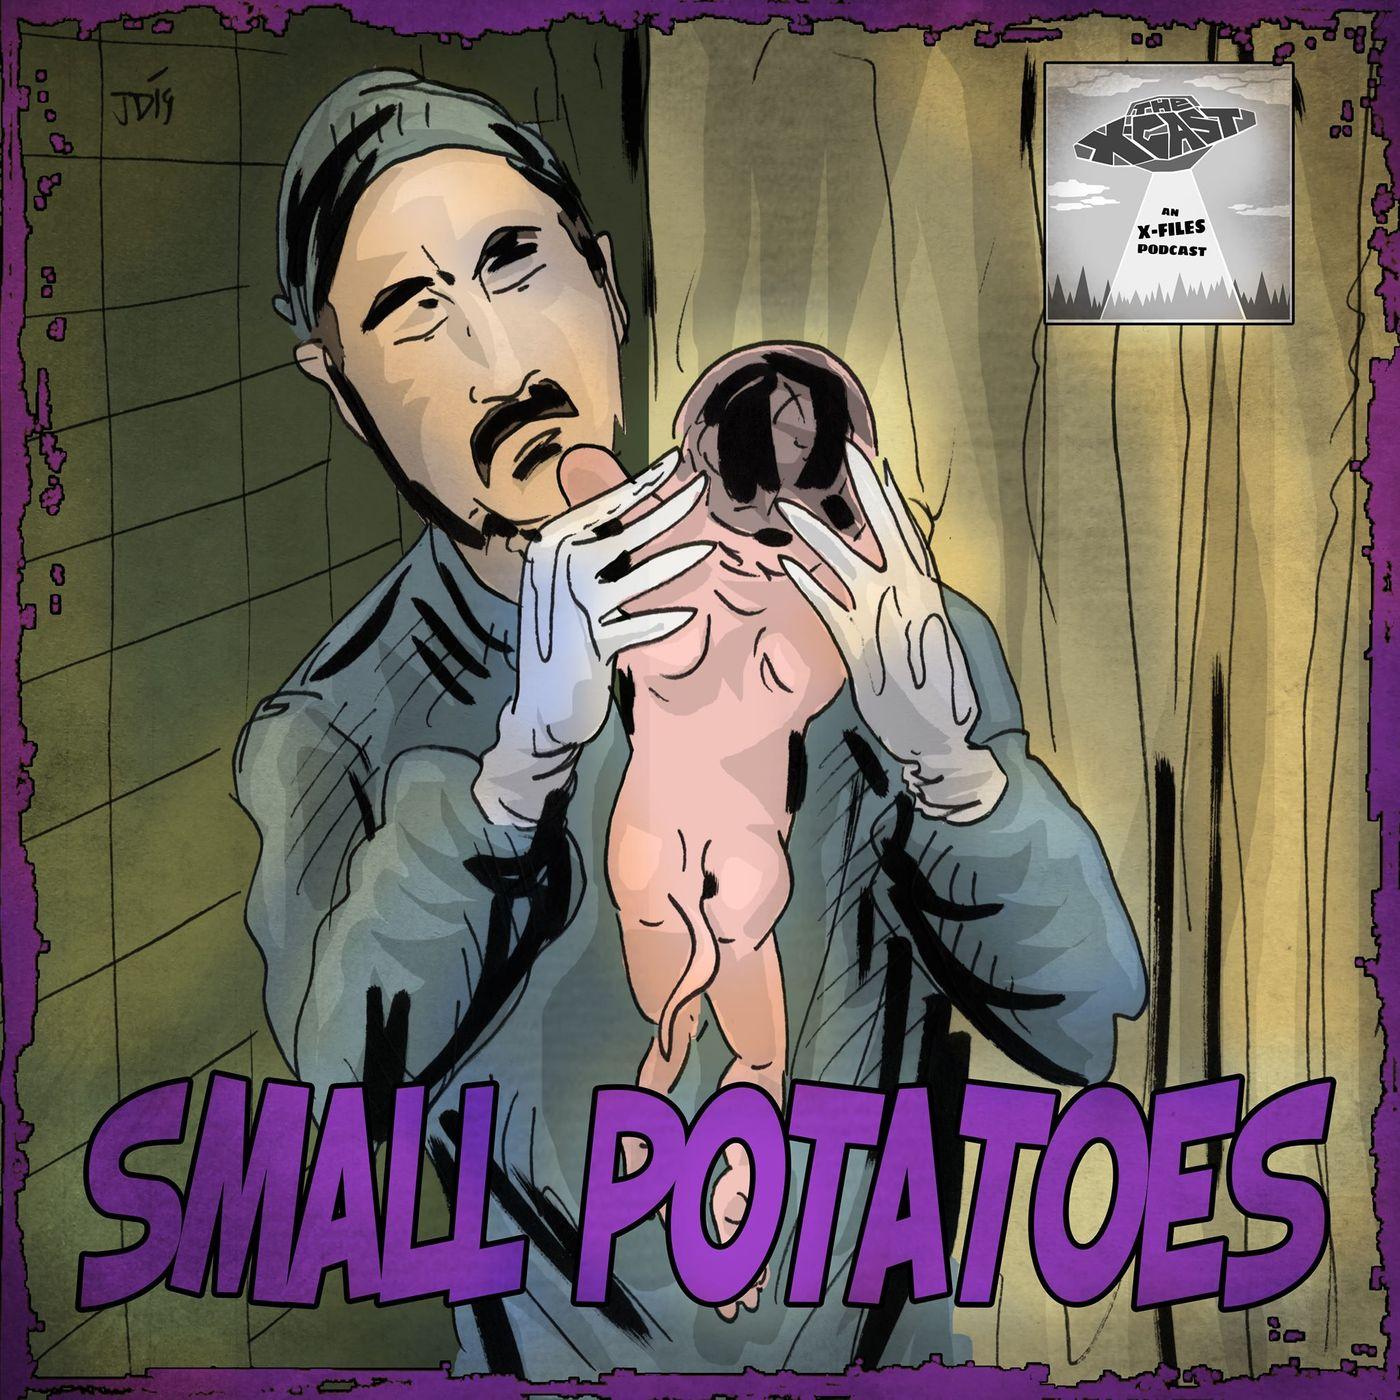 347. Small Potatoes